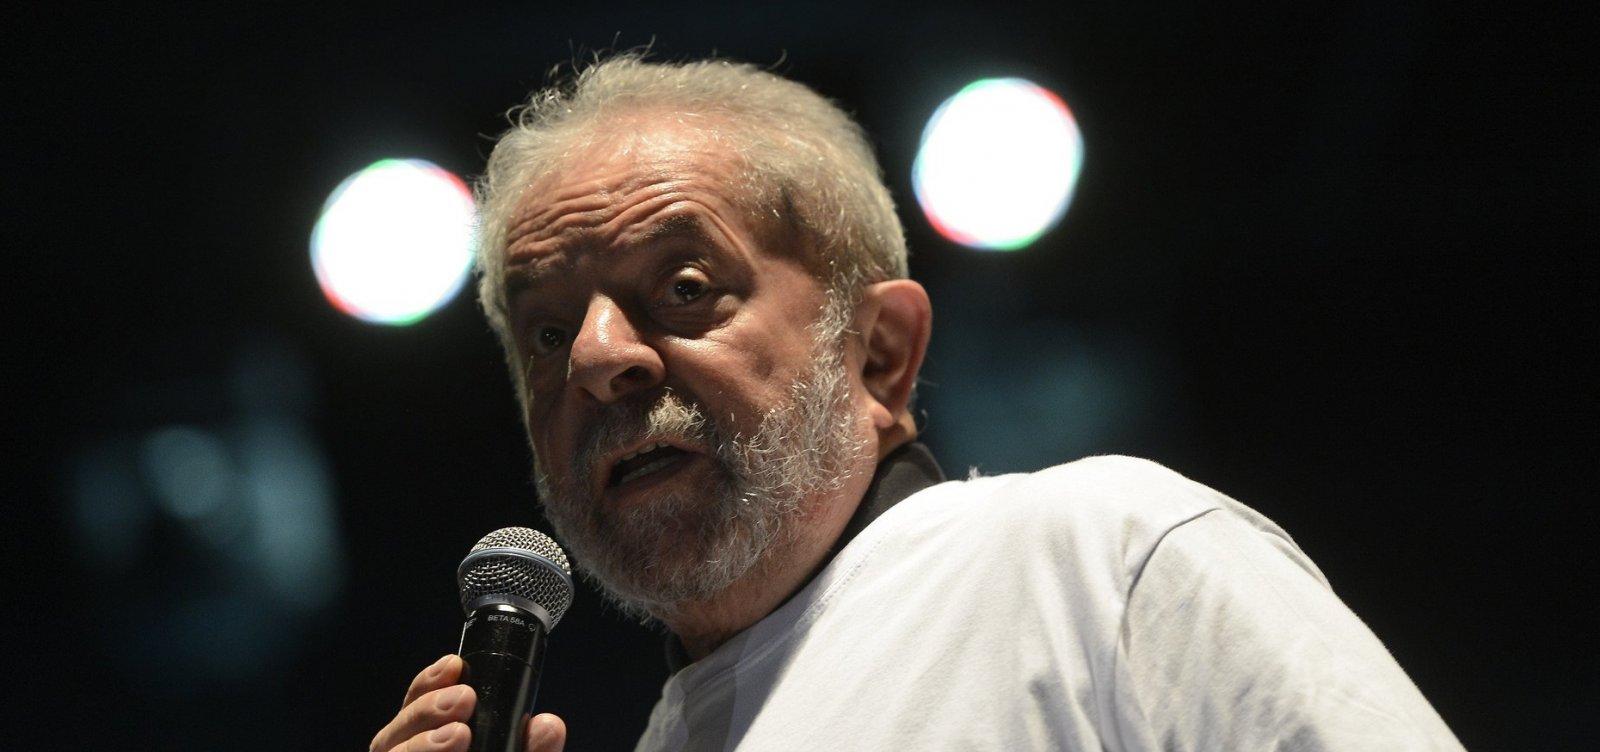 ['É maluquice', diz Lula sobre apelos para Haddad renunciar e Ciro concorrer]